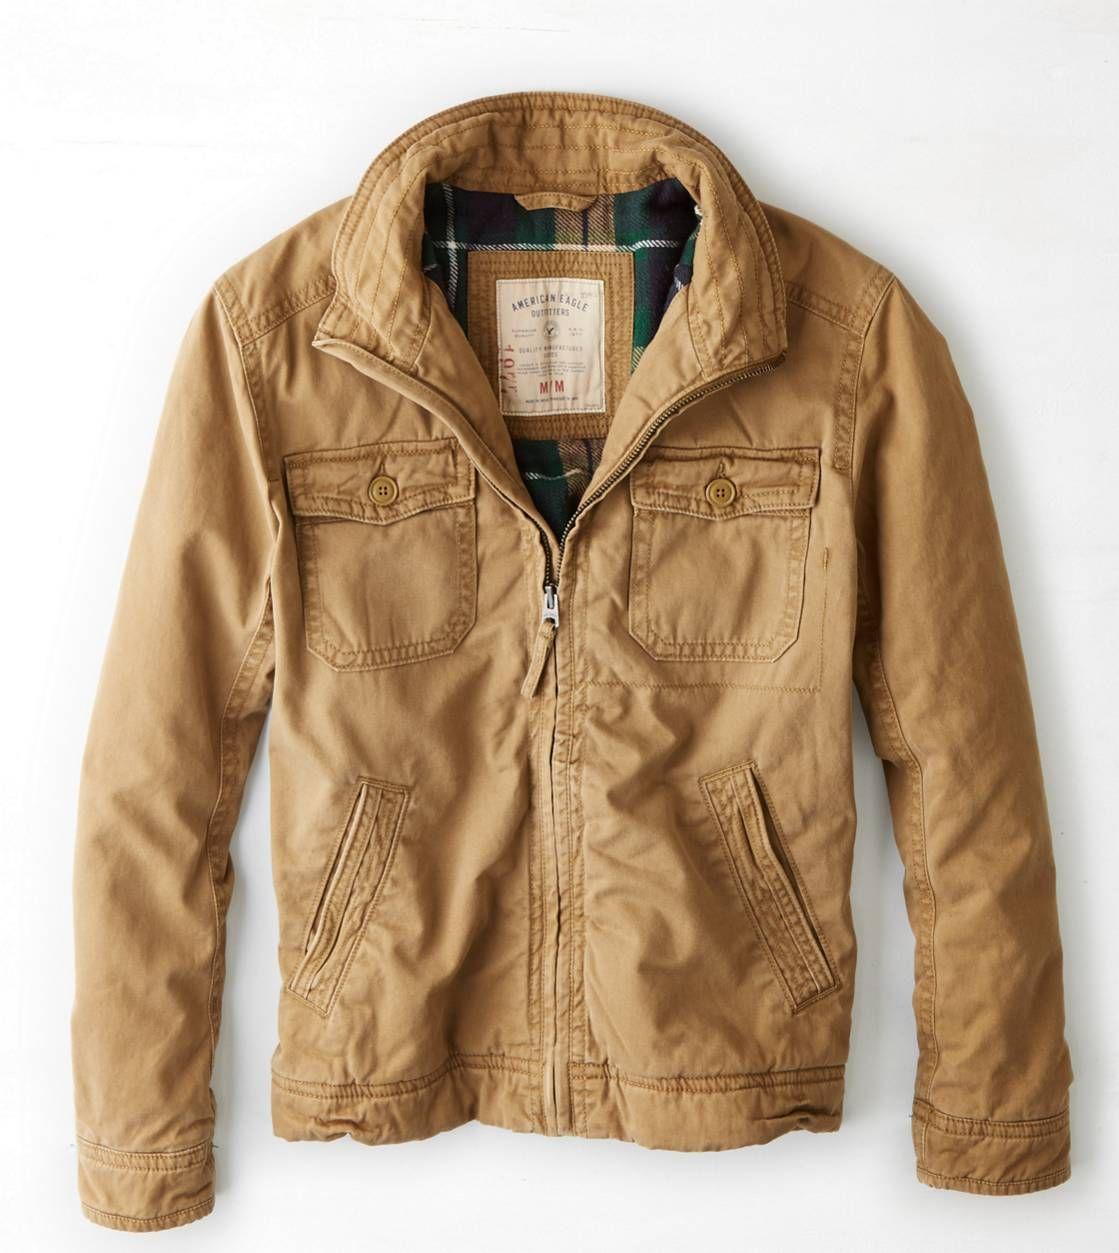 Aeo Vintage Workwear Jacket Jackets Mens Jackets Coats